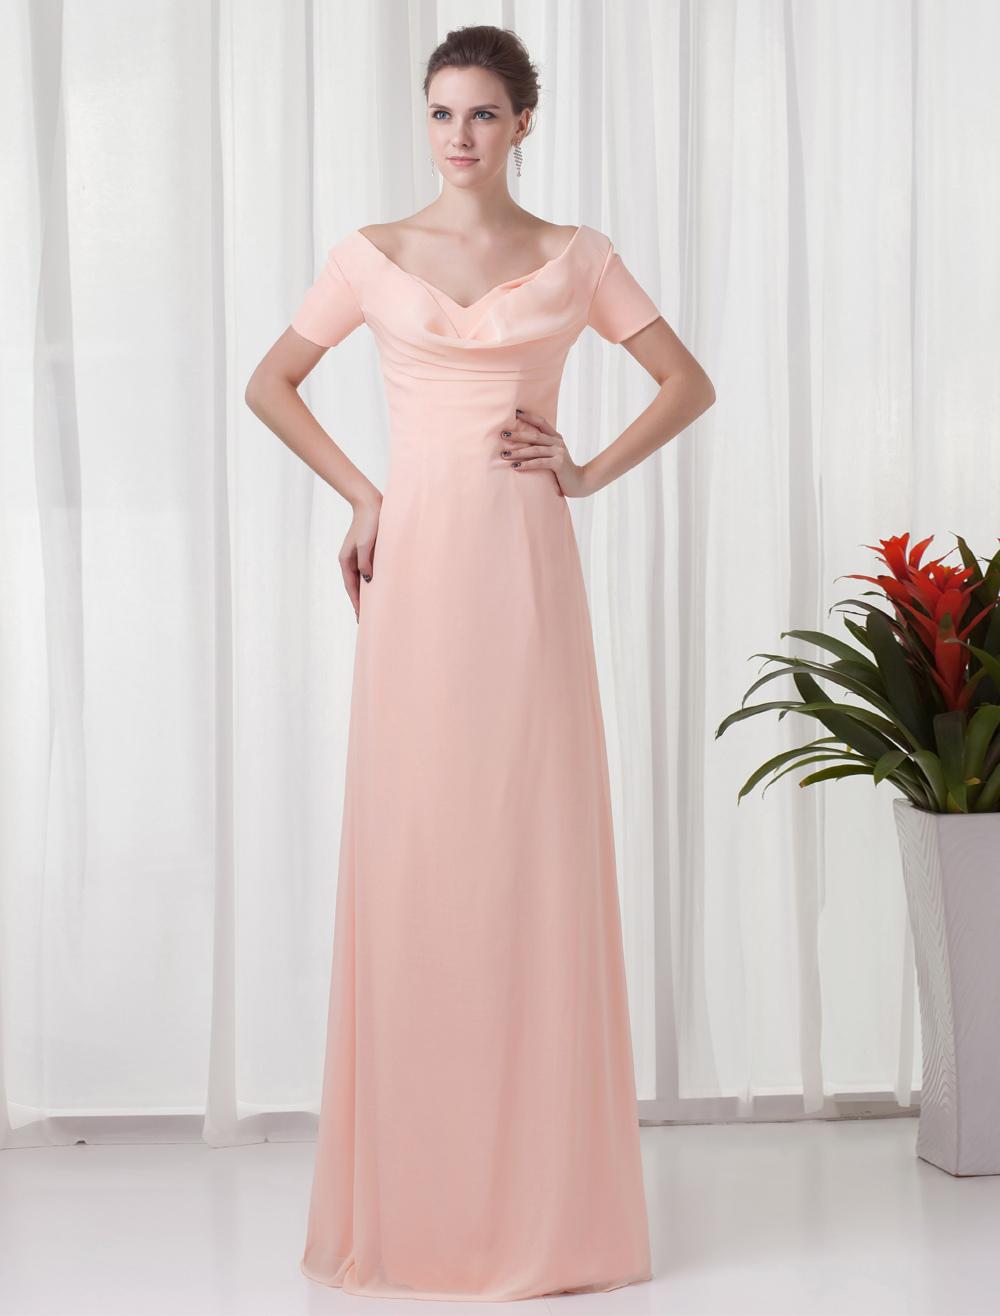 Chiffon Mother Of The Bride Dress Peach Short Sleeve Evening Dress V Back Floor Length Occasion Dress (Wedding) photo